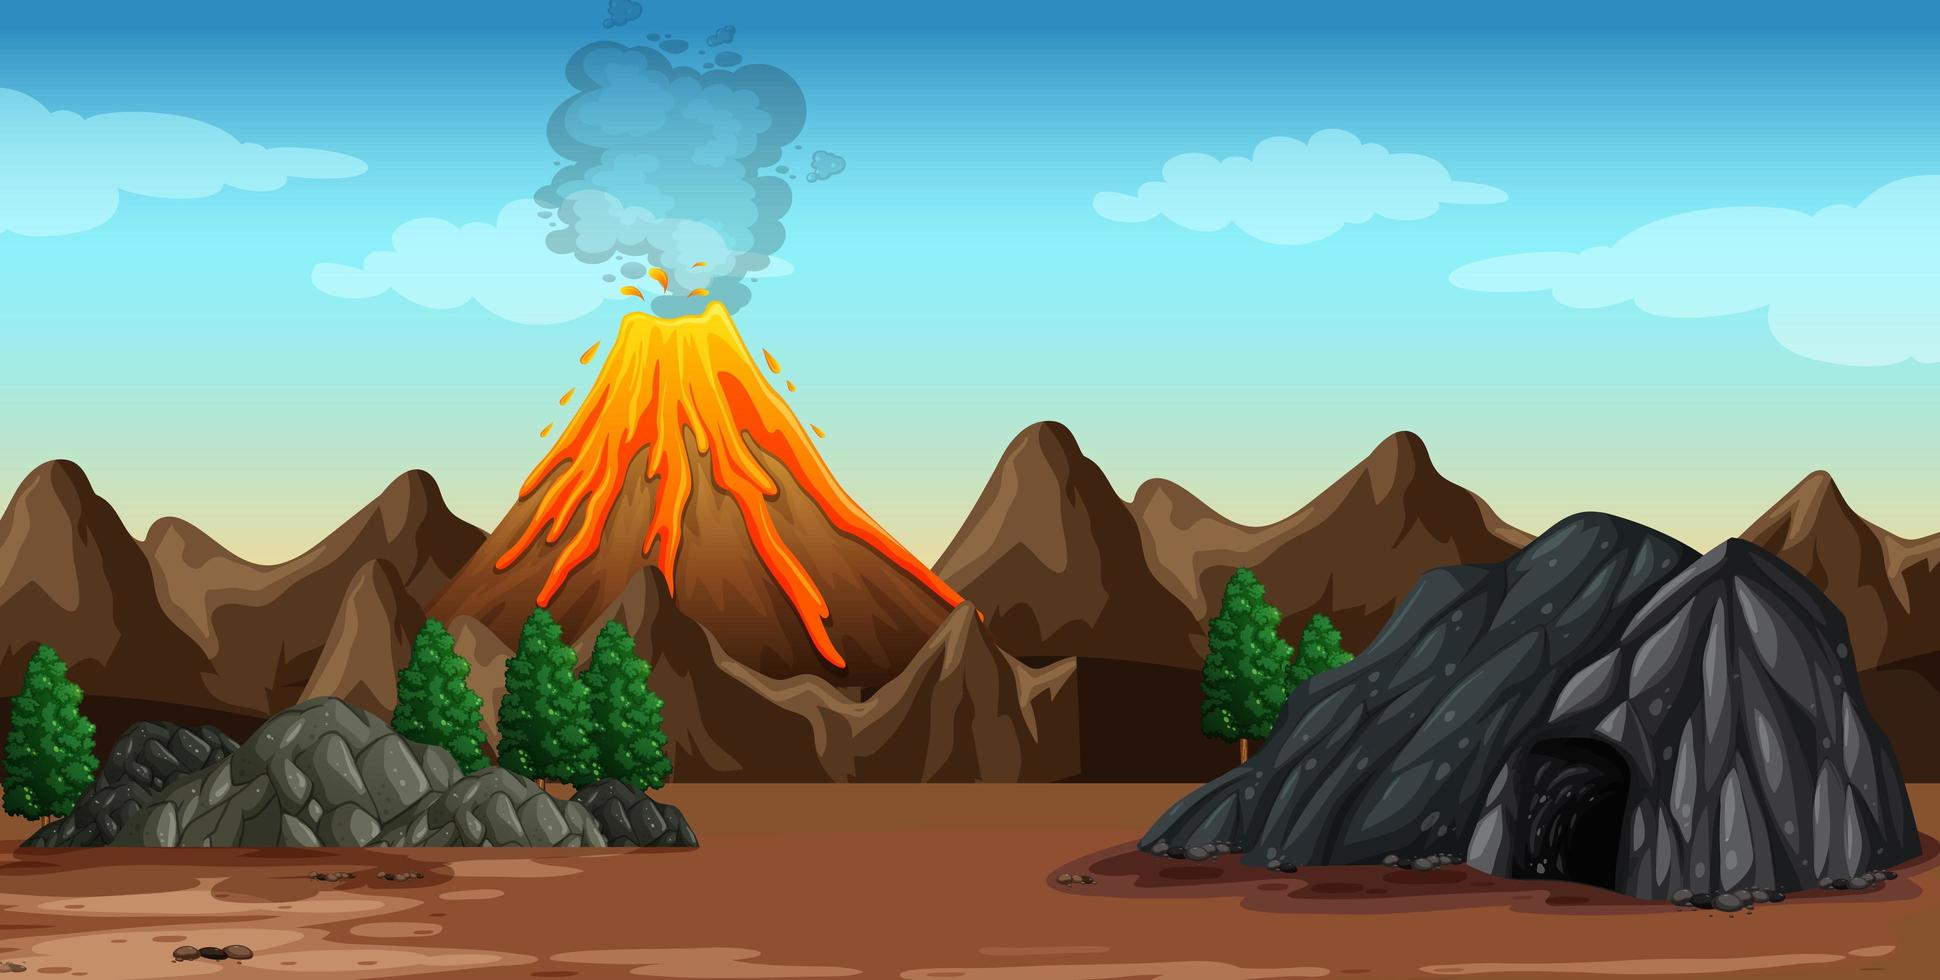 vulkanutbrott i naturscenen vektor